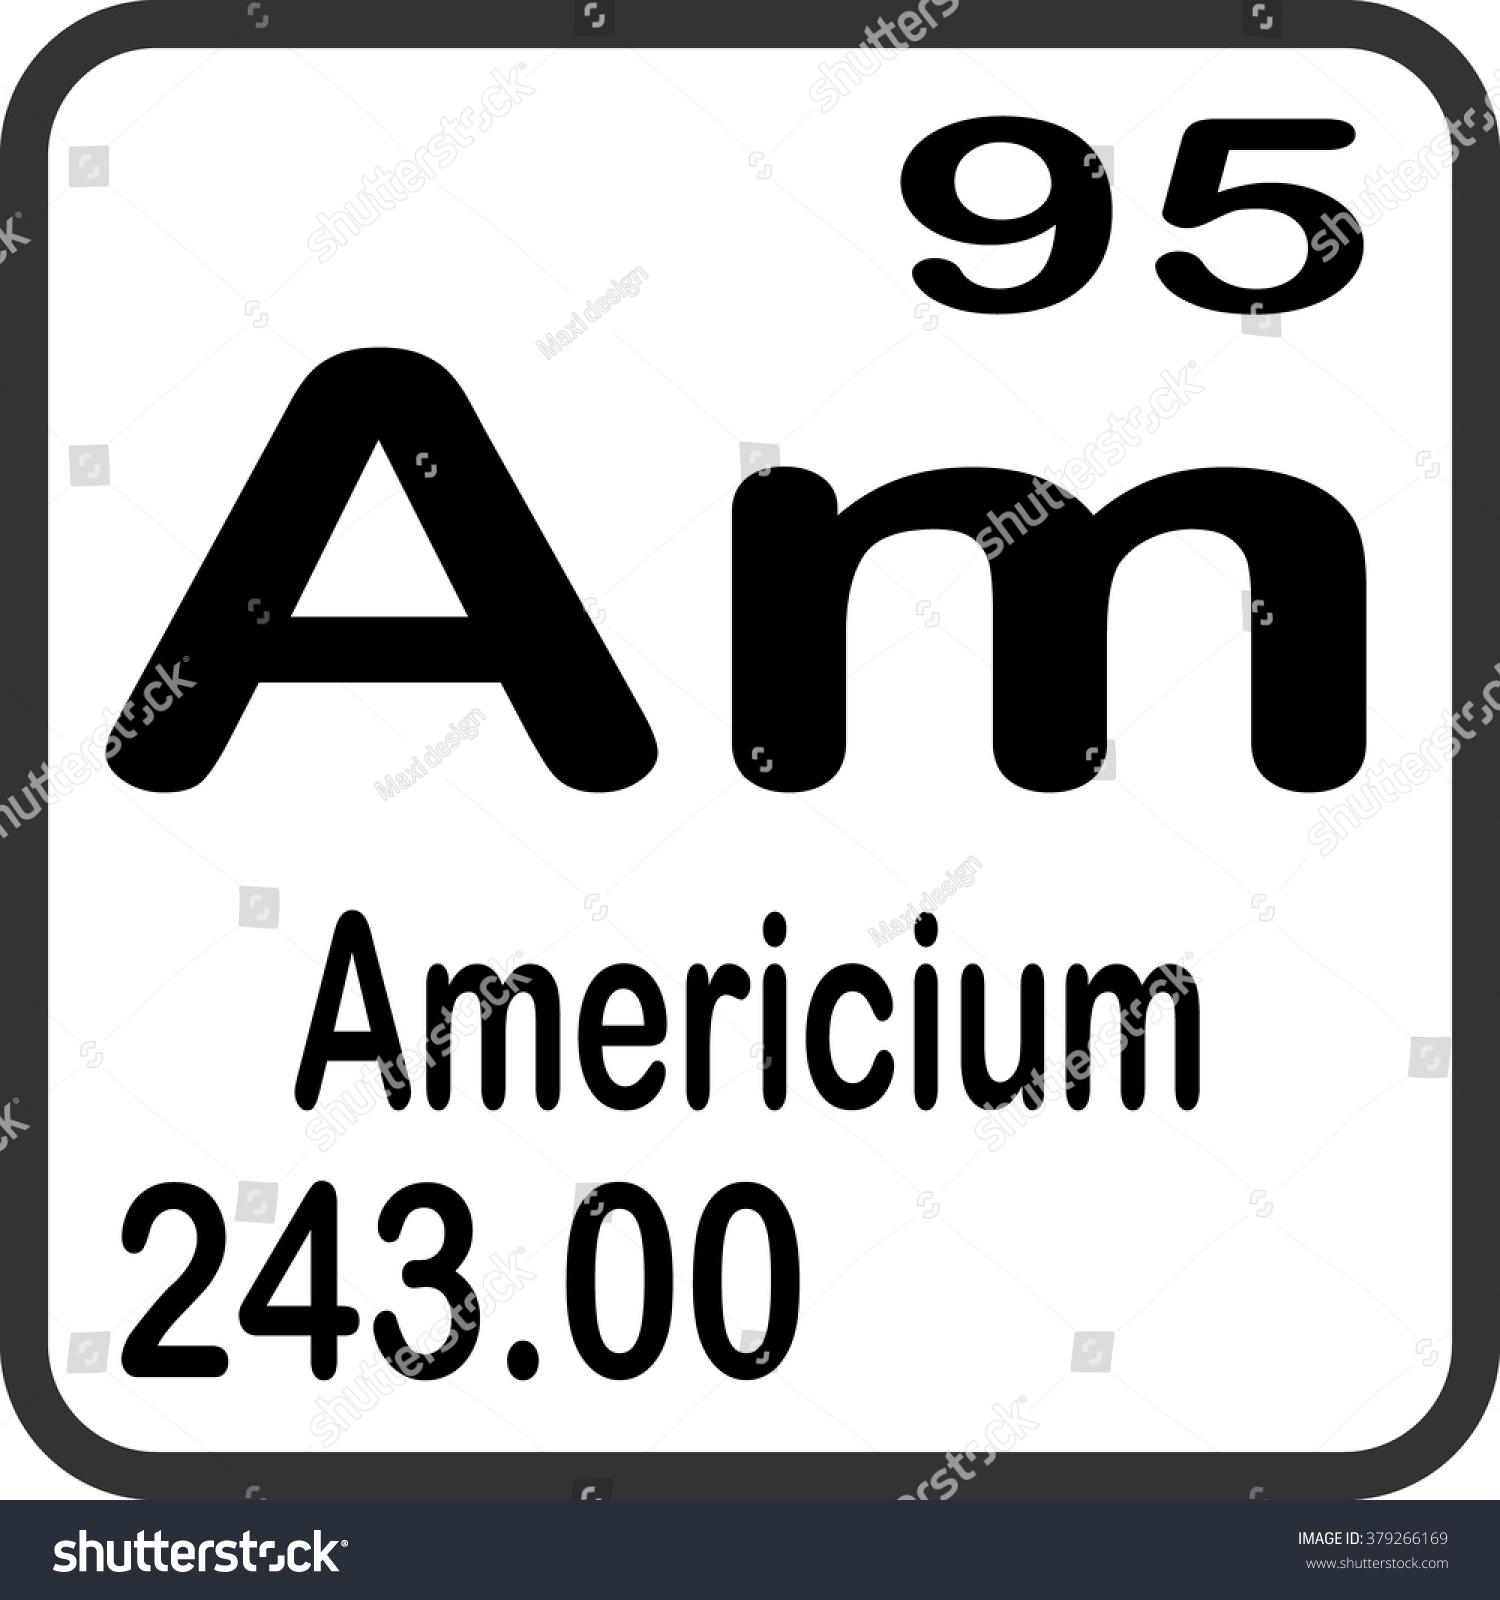 Periodic table elements americium stock vector 379266169 periodic table of elements americium gamestrikefo Gallery